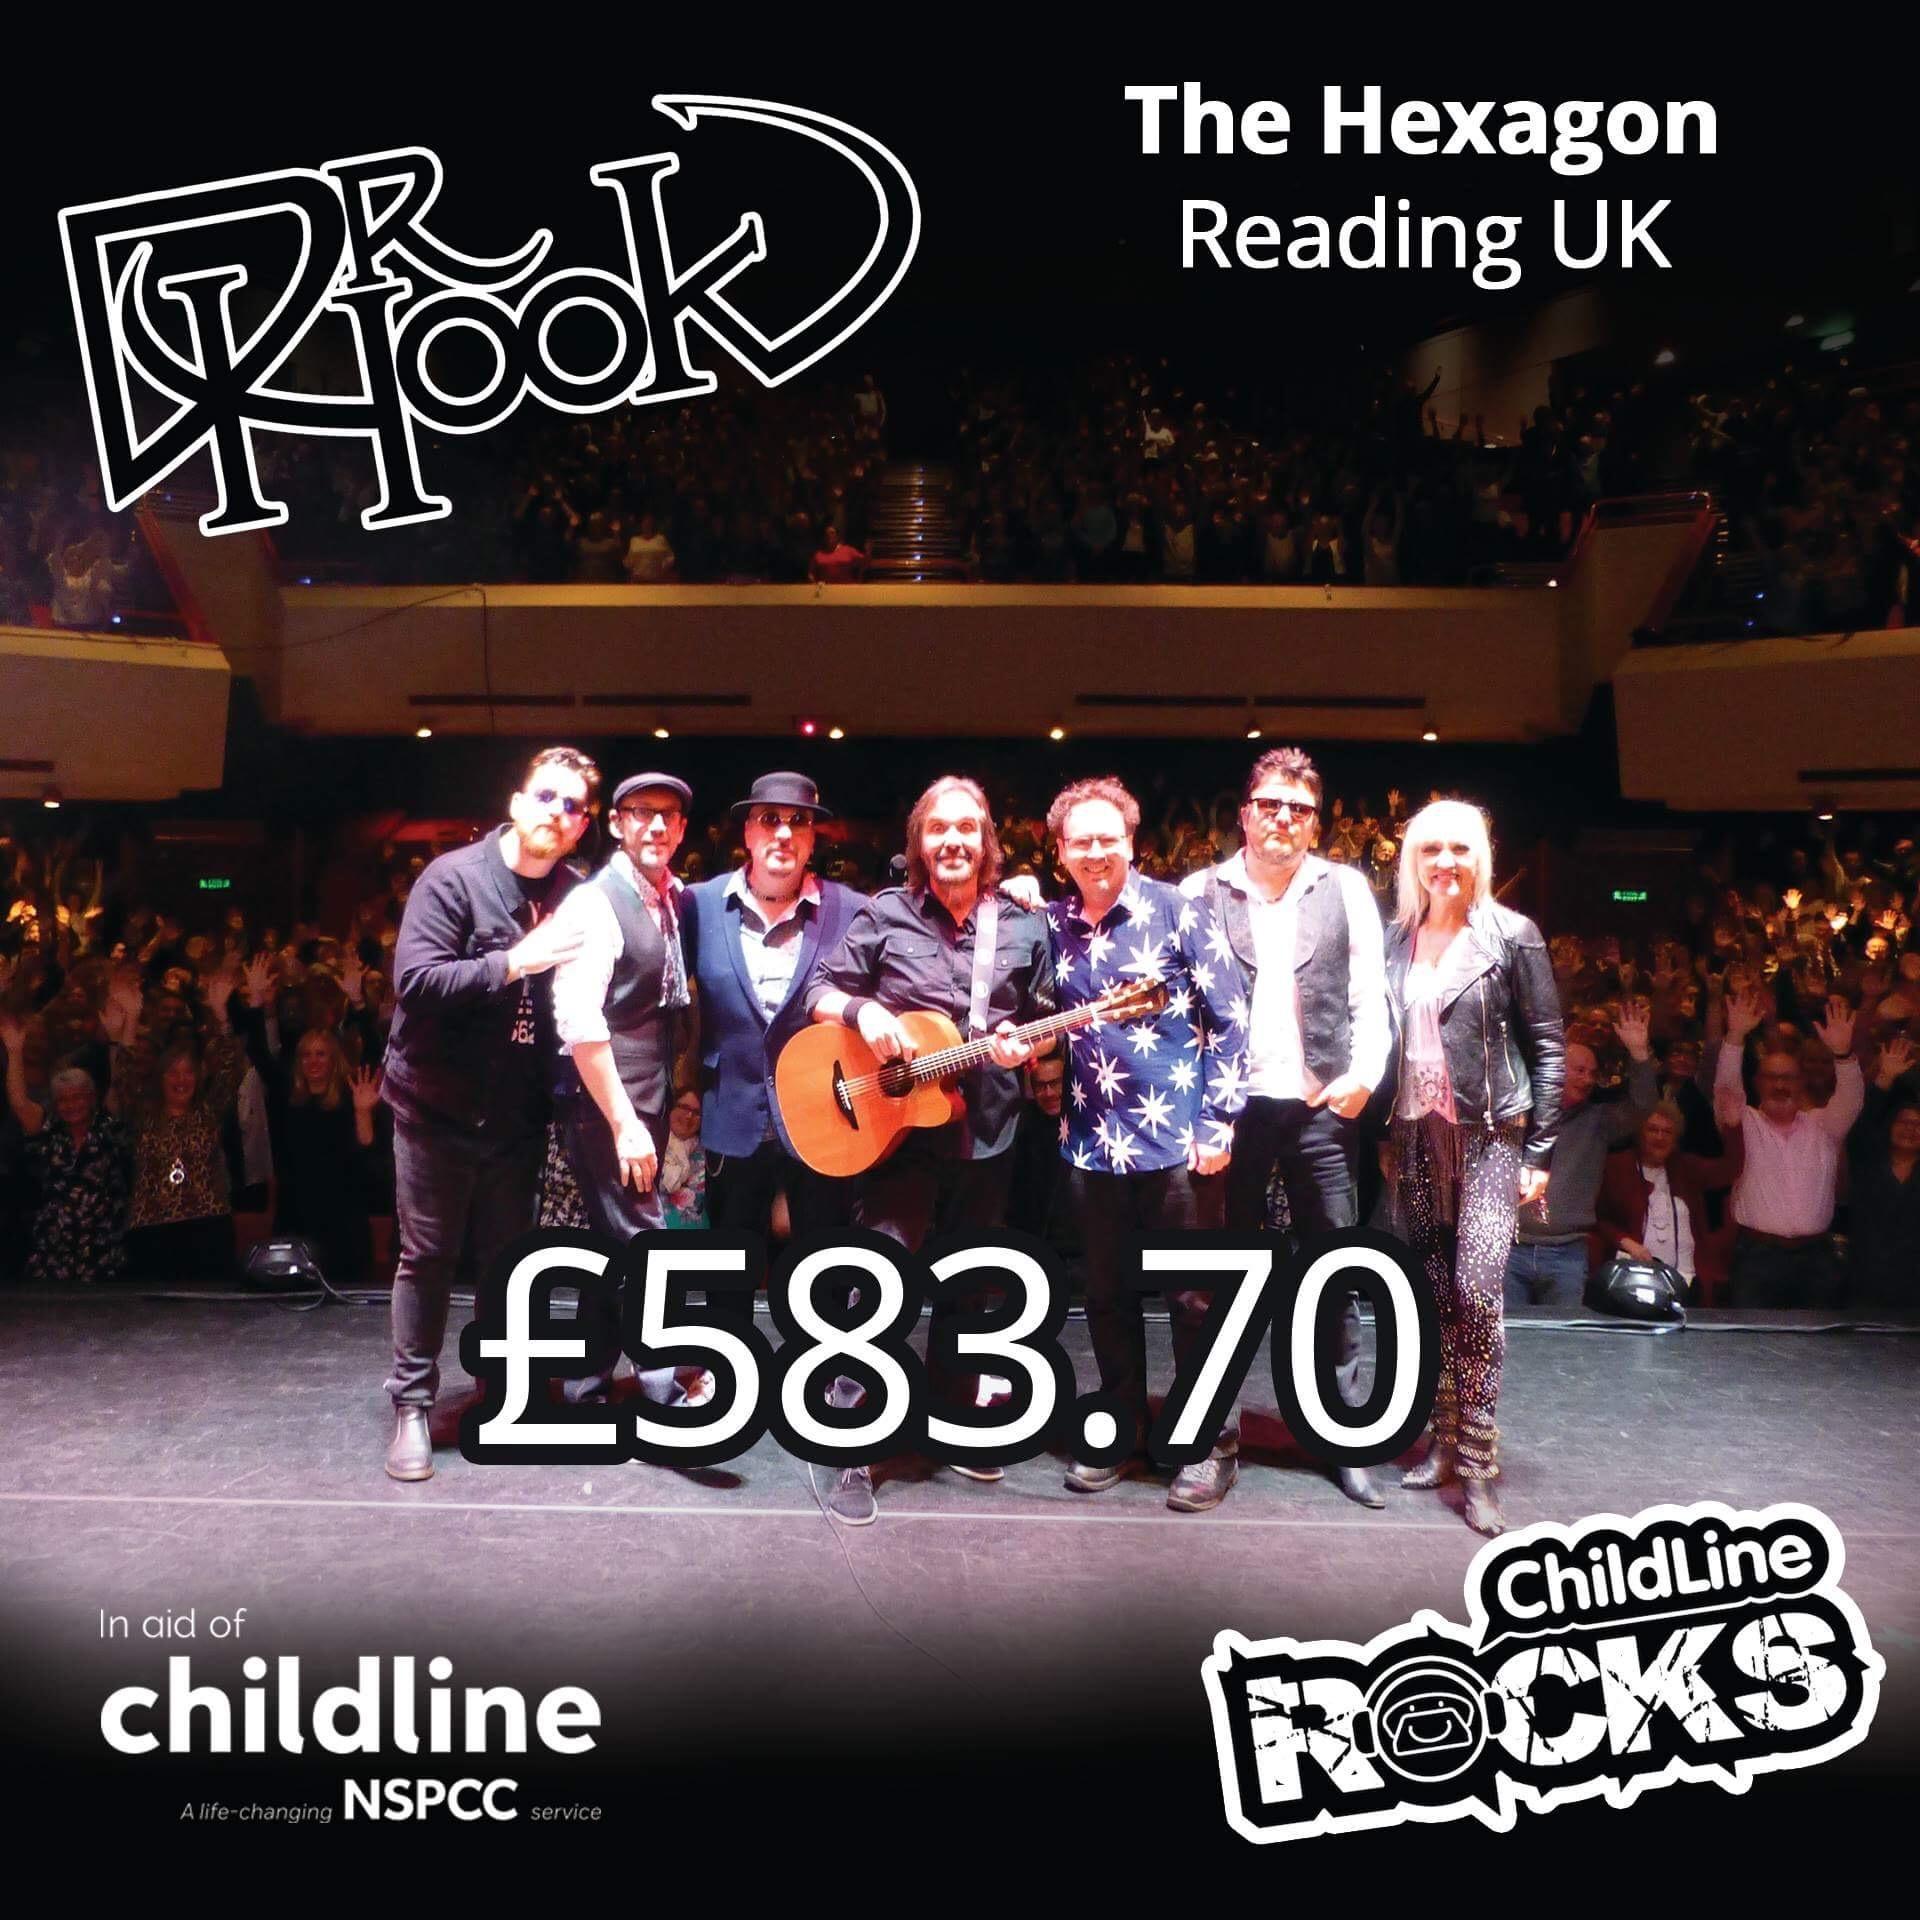 Dr Hook   UK & IE Tour   2017   Fundraising For NSPCC Childline   Reading UK